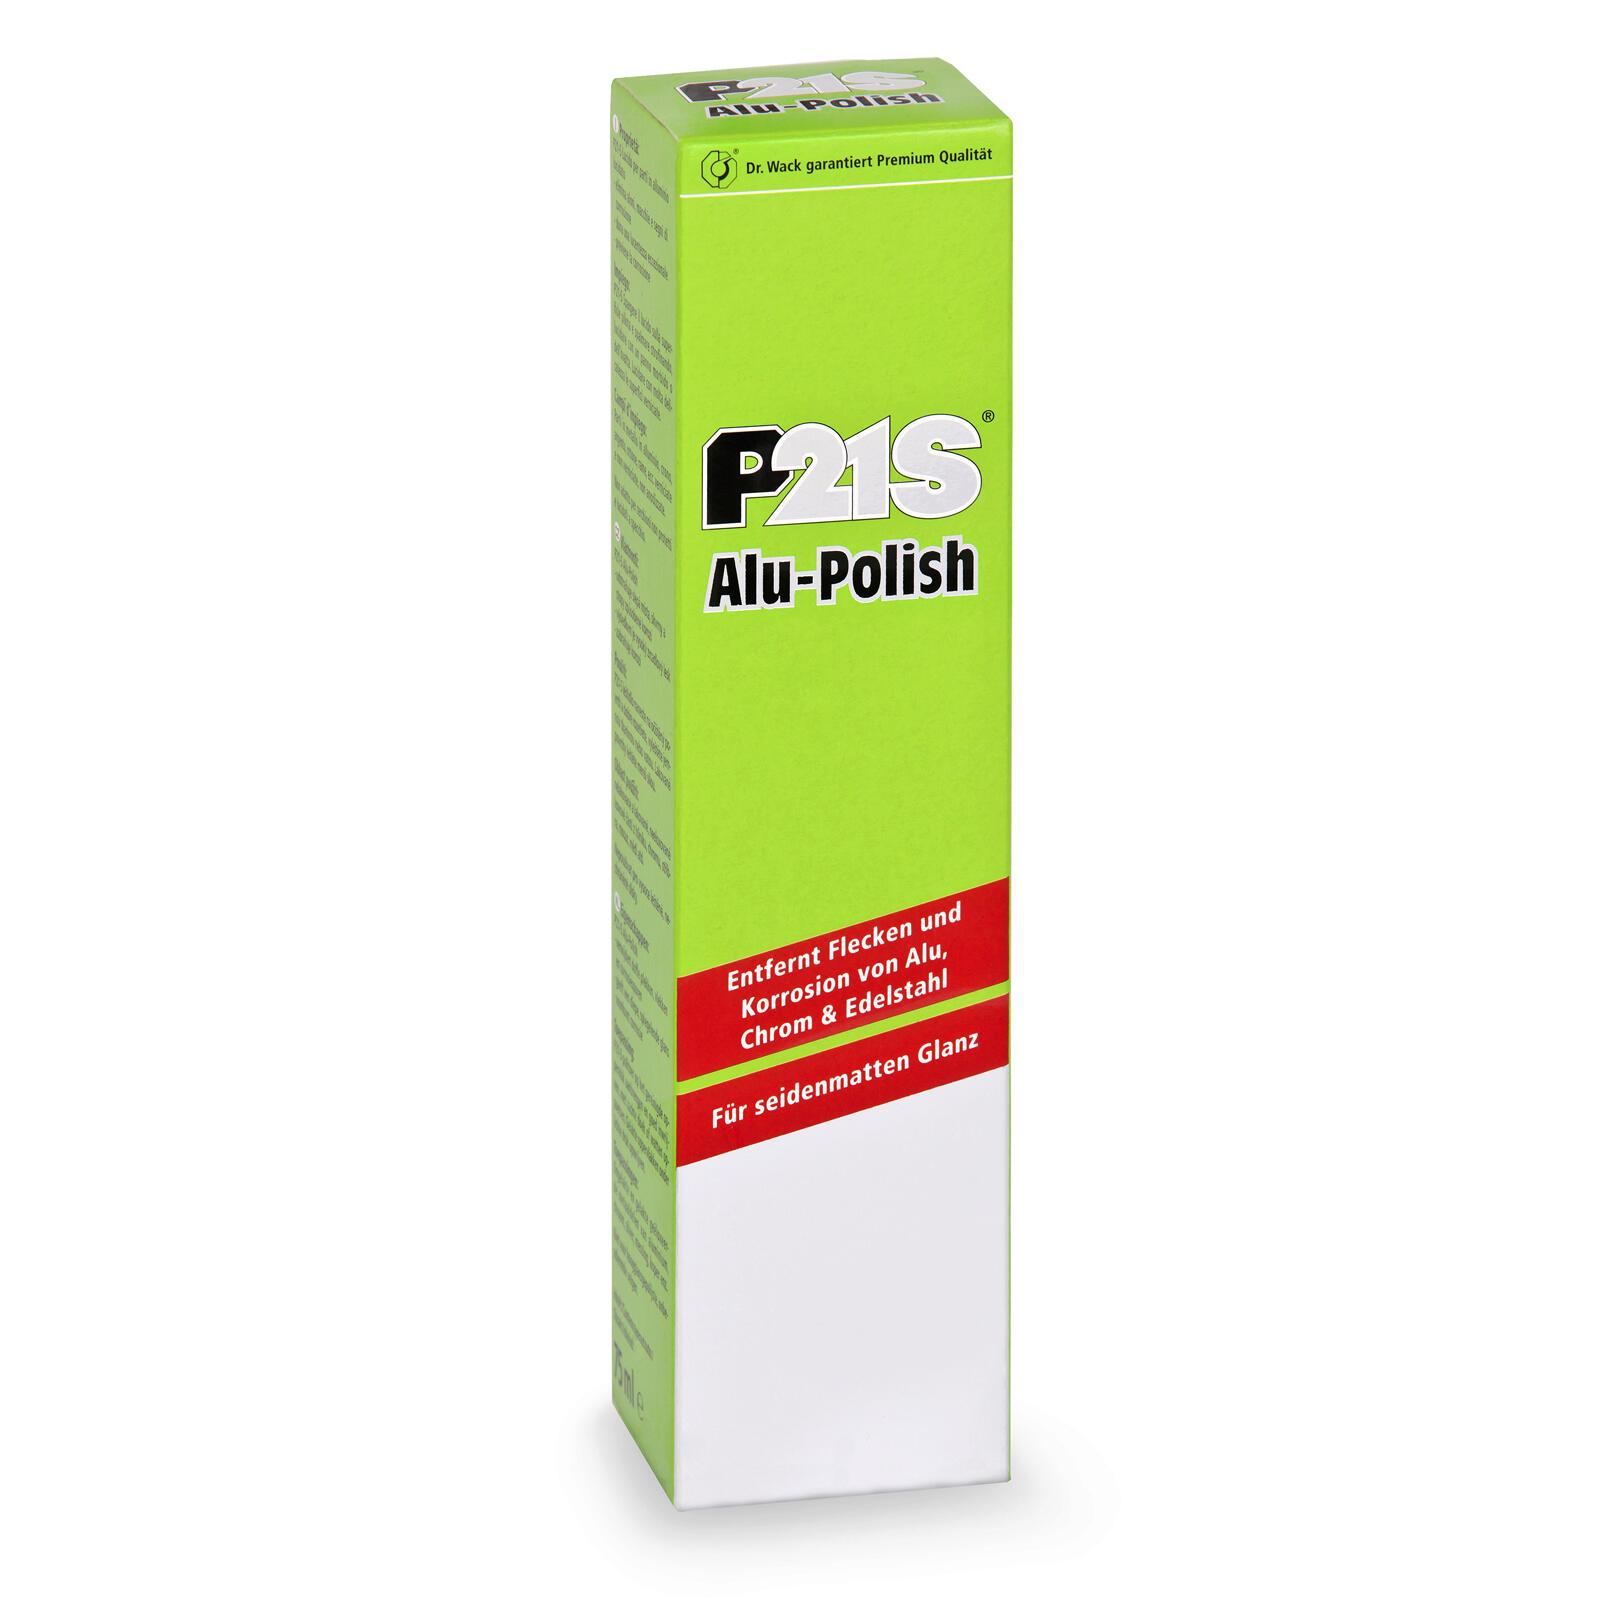 Dr. Wack Alu-Polish 75 ML Felgenreiniger effektiv für Alu Chrom Edelstahl